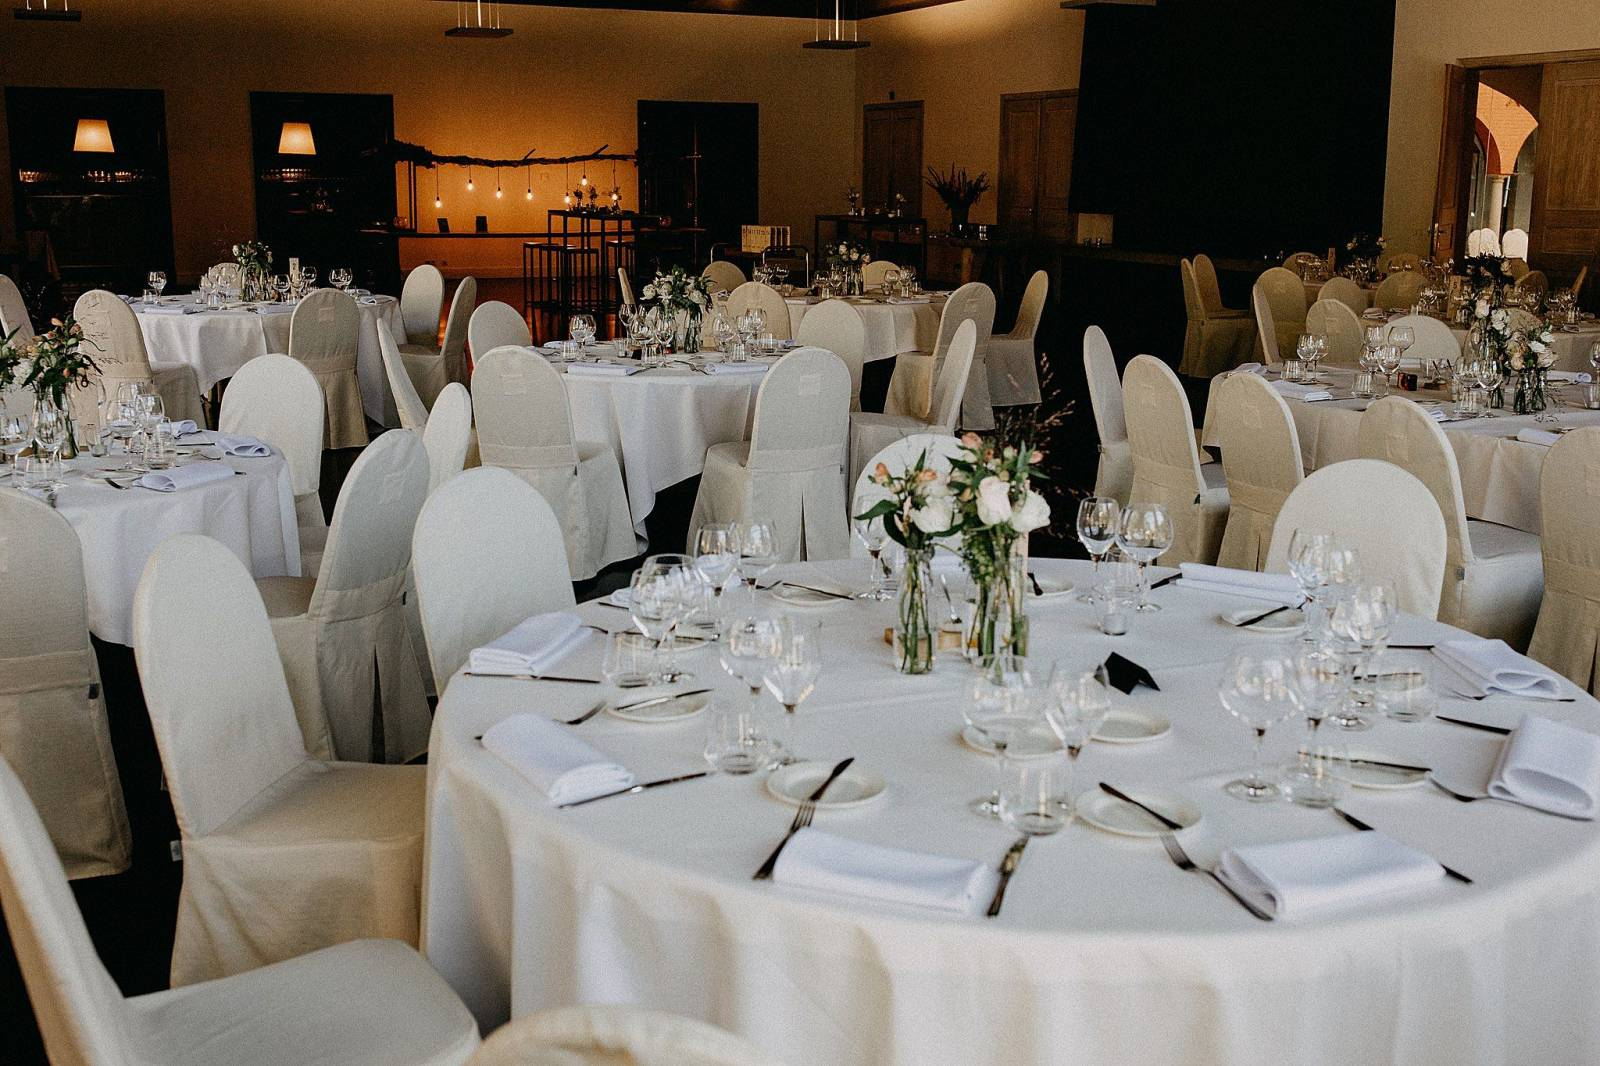 De Barrier - Feestzaal -  House of Weddings - 16